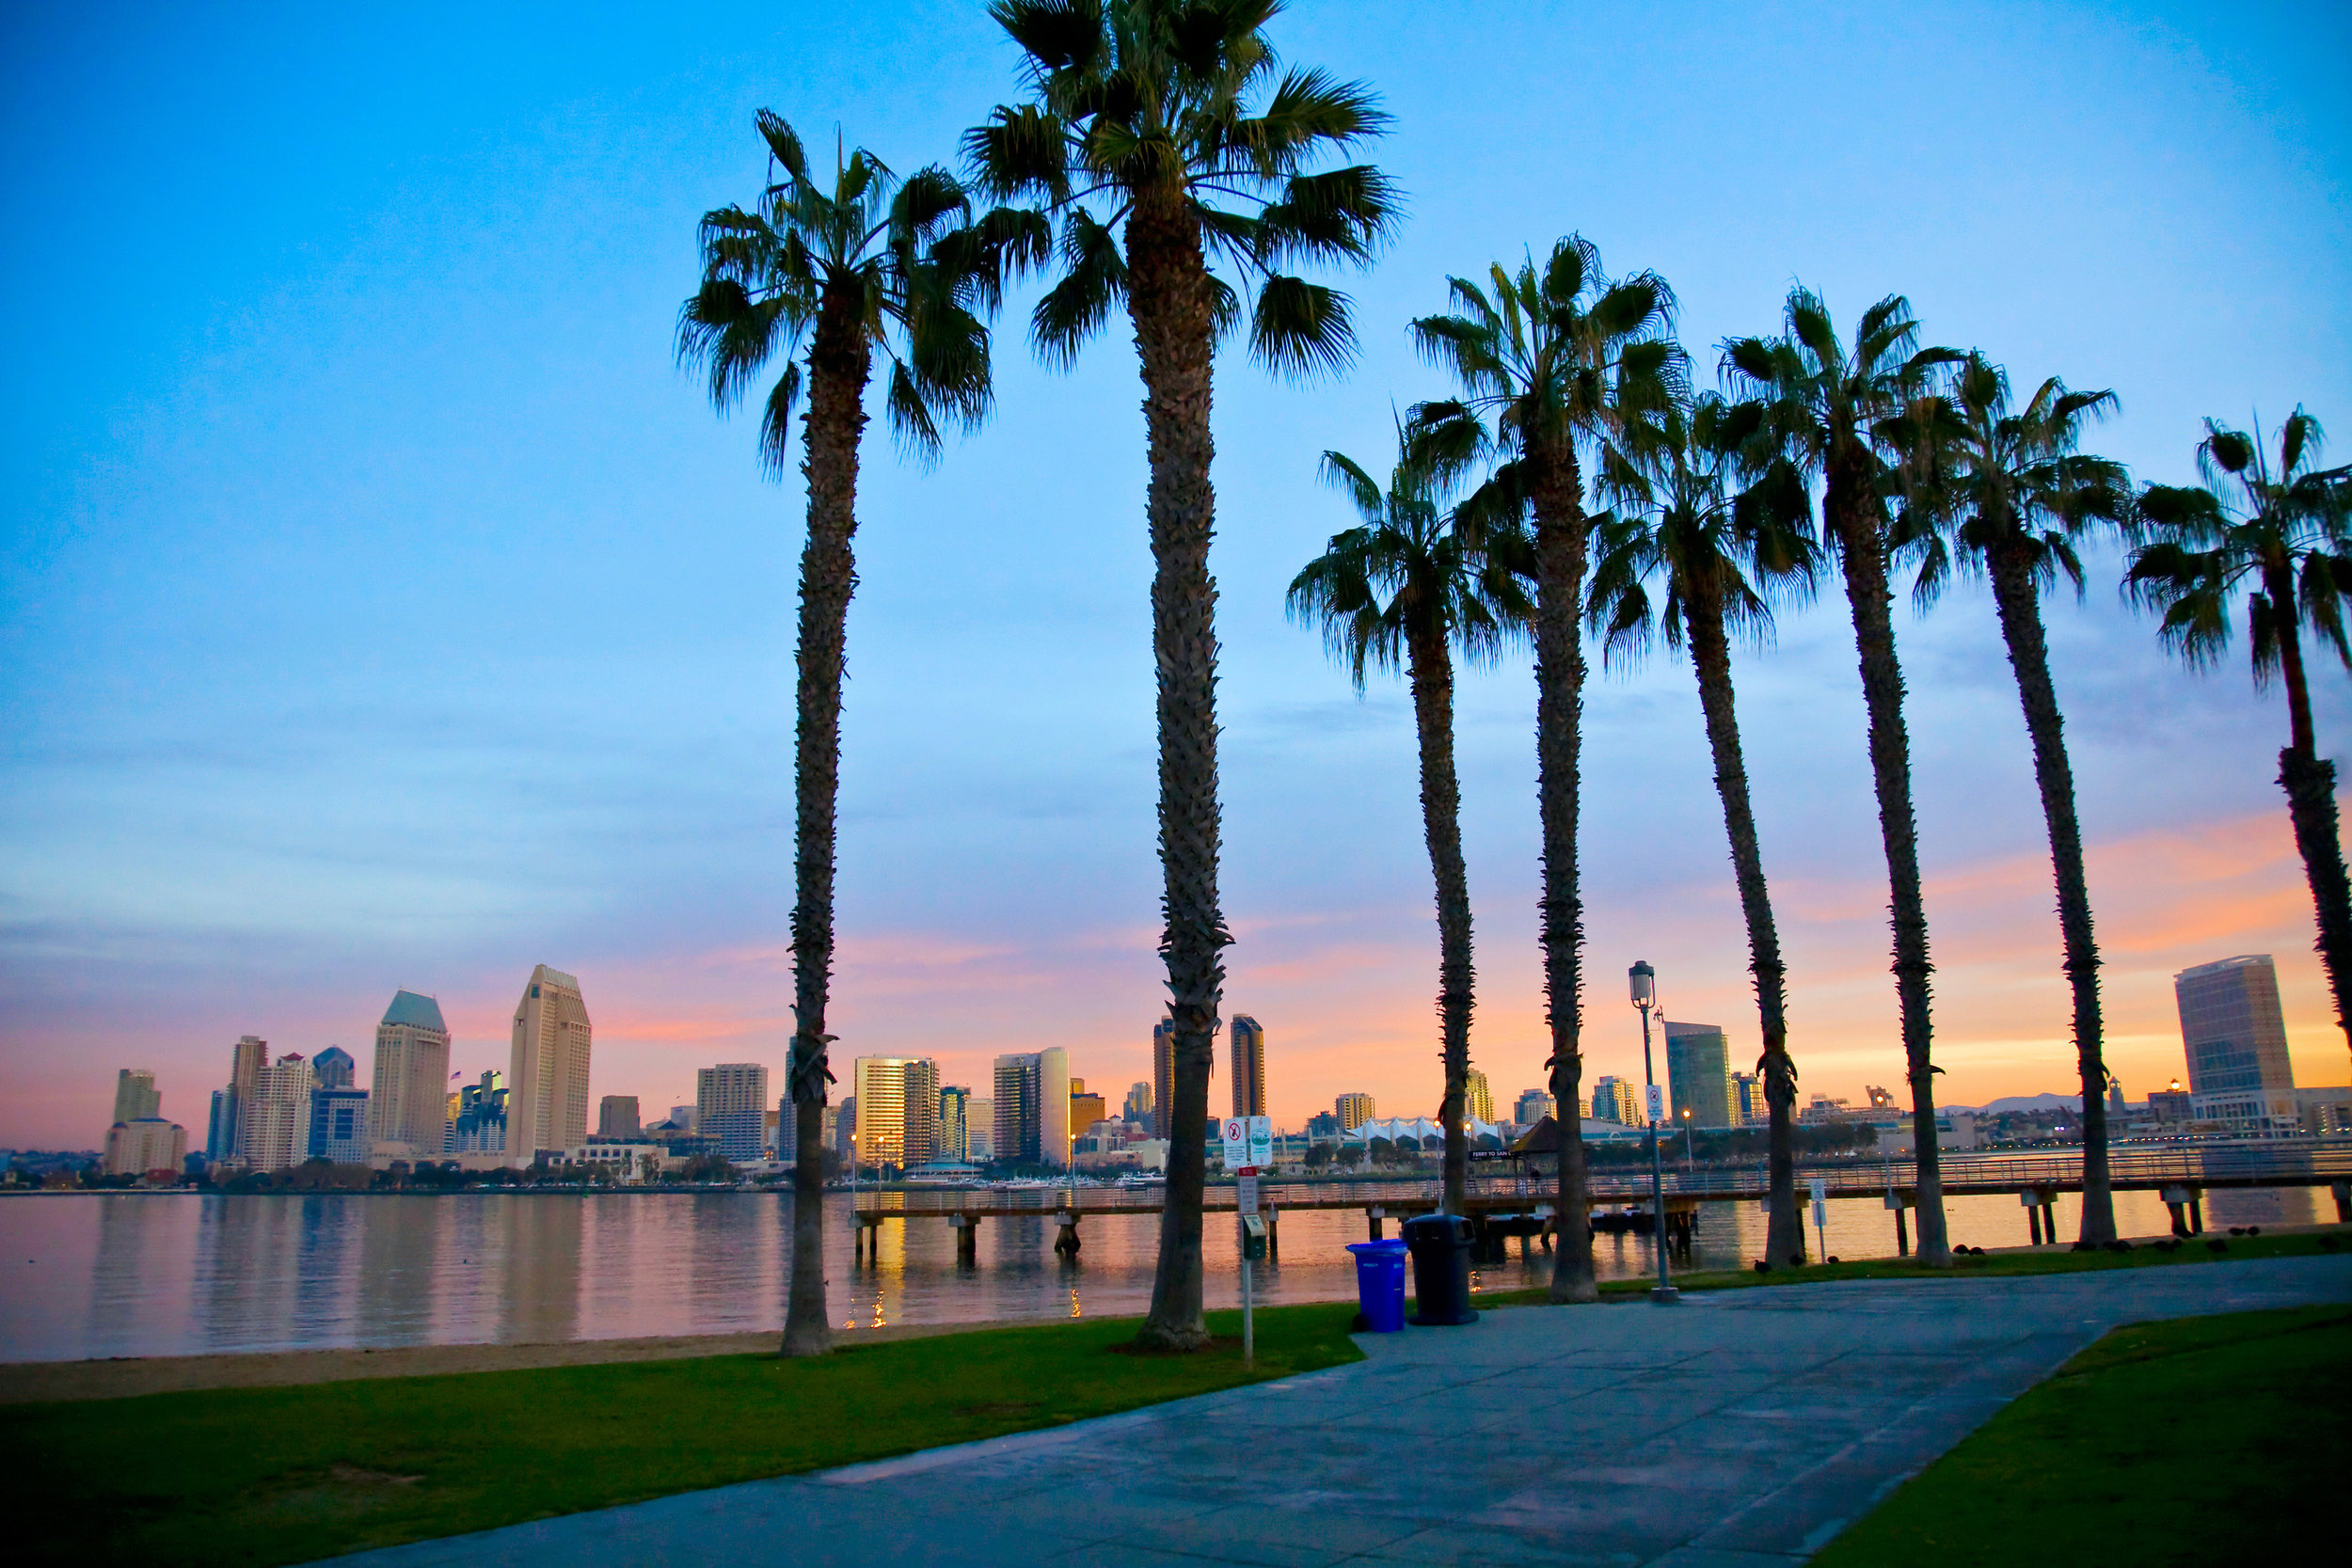 bigstock-San-Diego-from-Ferry-Landing-i-26249672.jpg